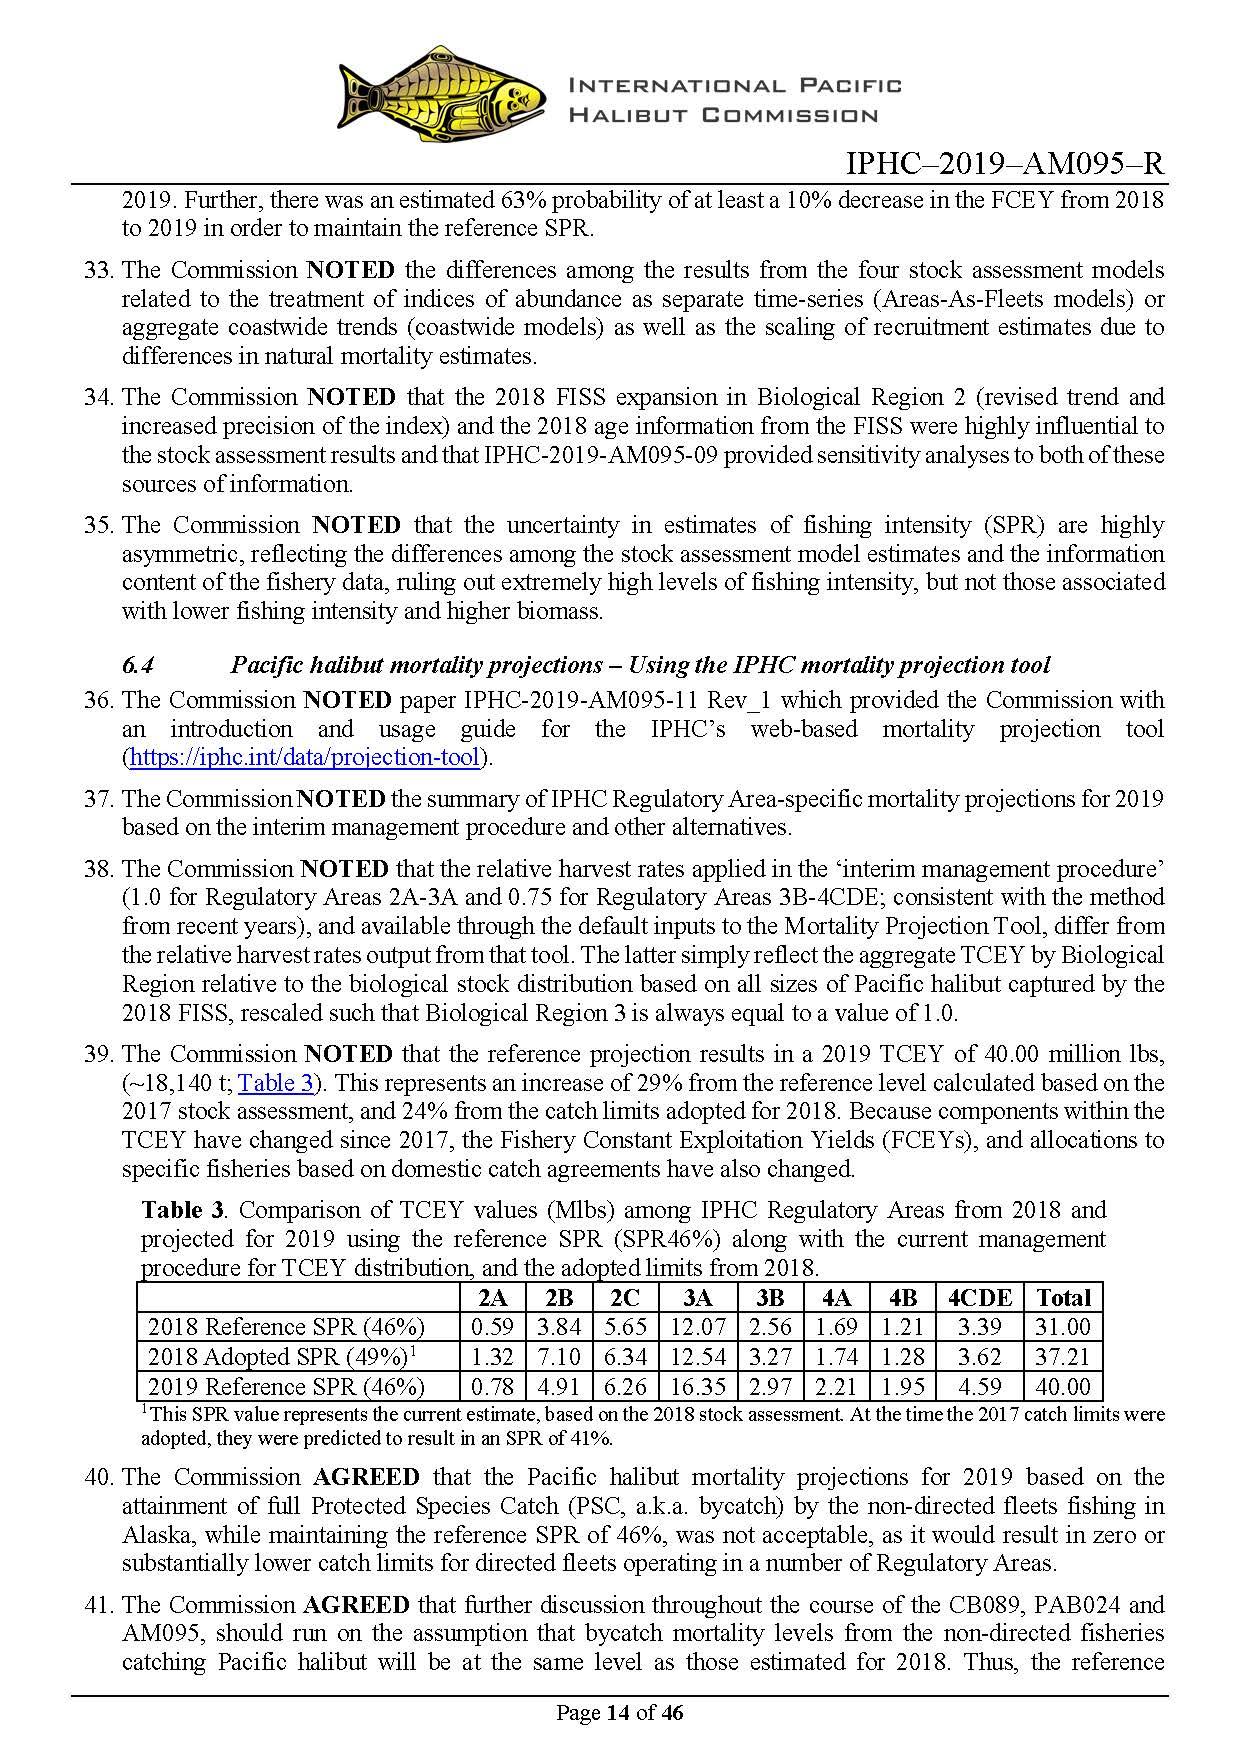 iphc-2019-am095-r_Page_14.jpg